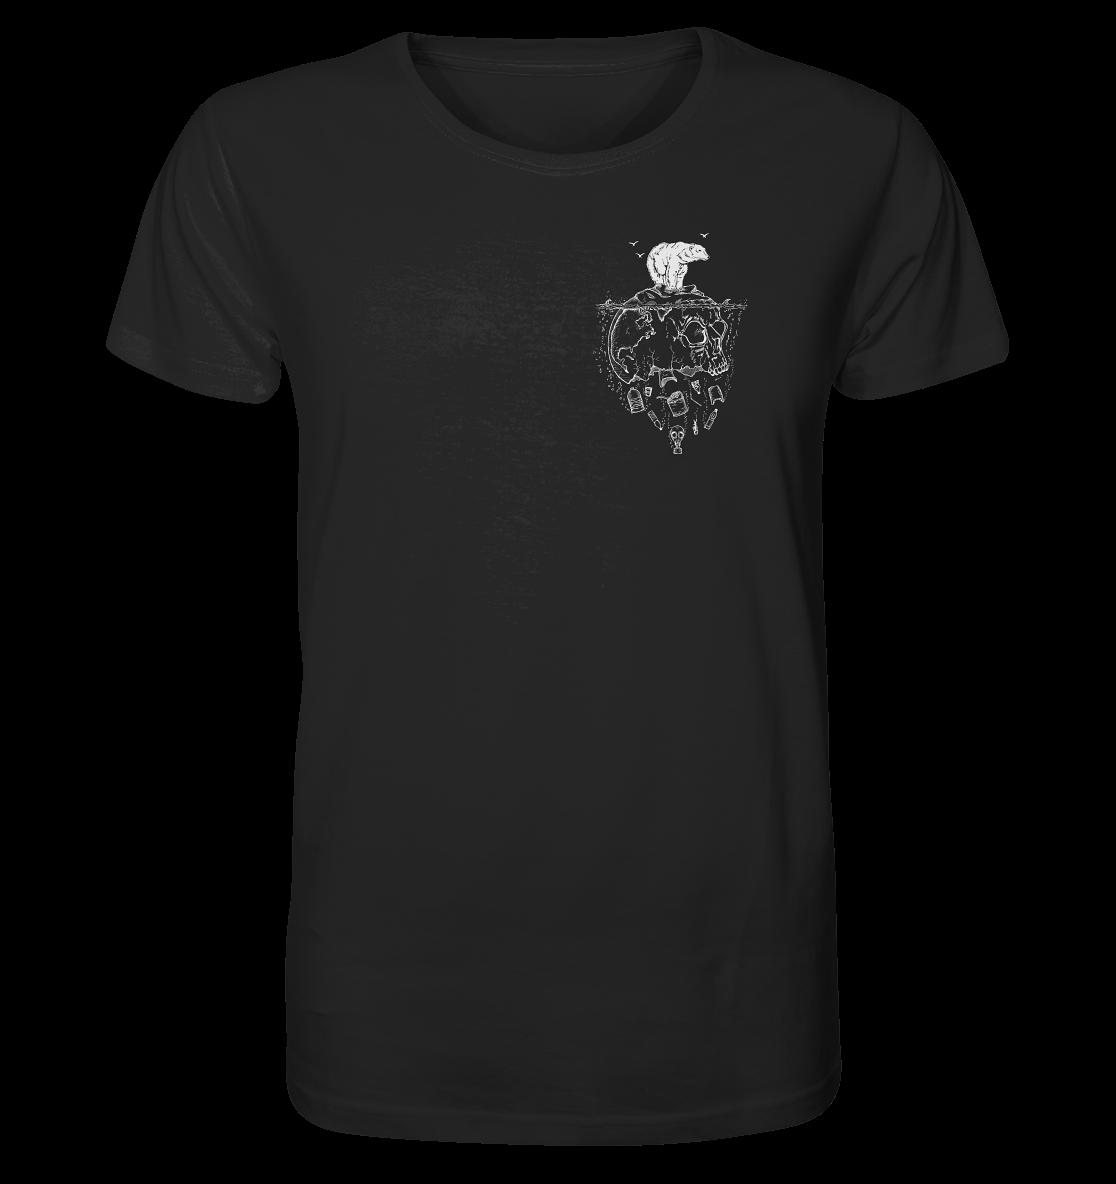 front-organic-shirt-272727-1116x-16.png